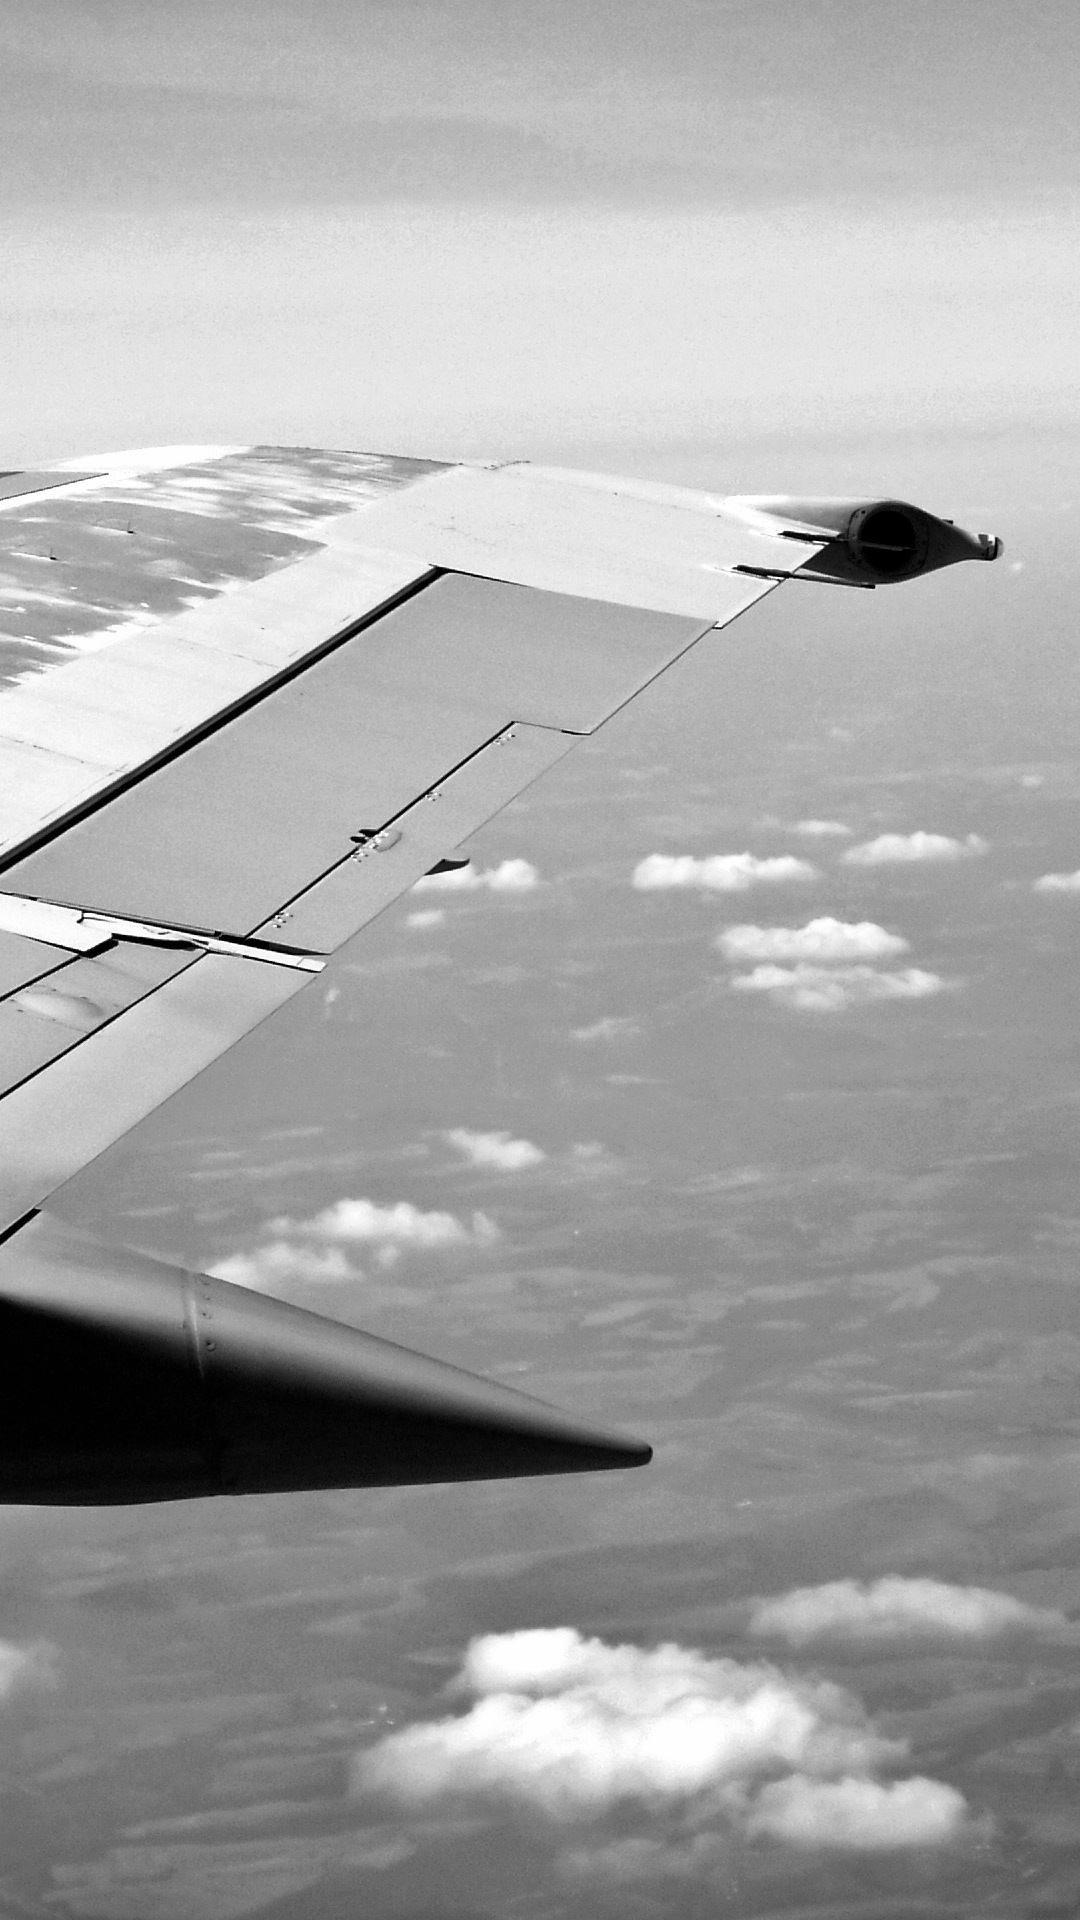 Airplane s7 Edge Wallpaper